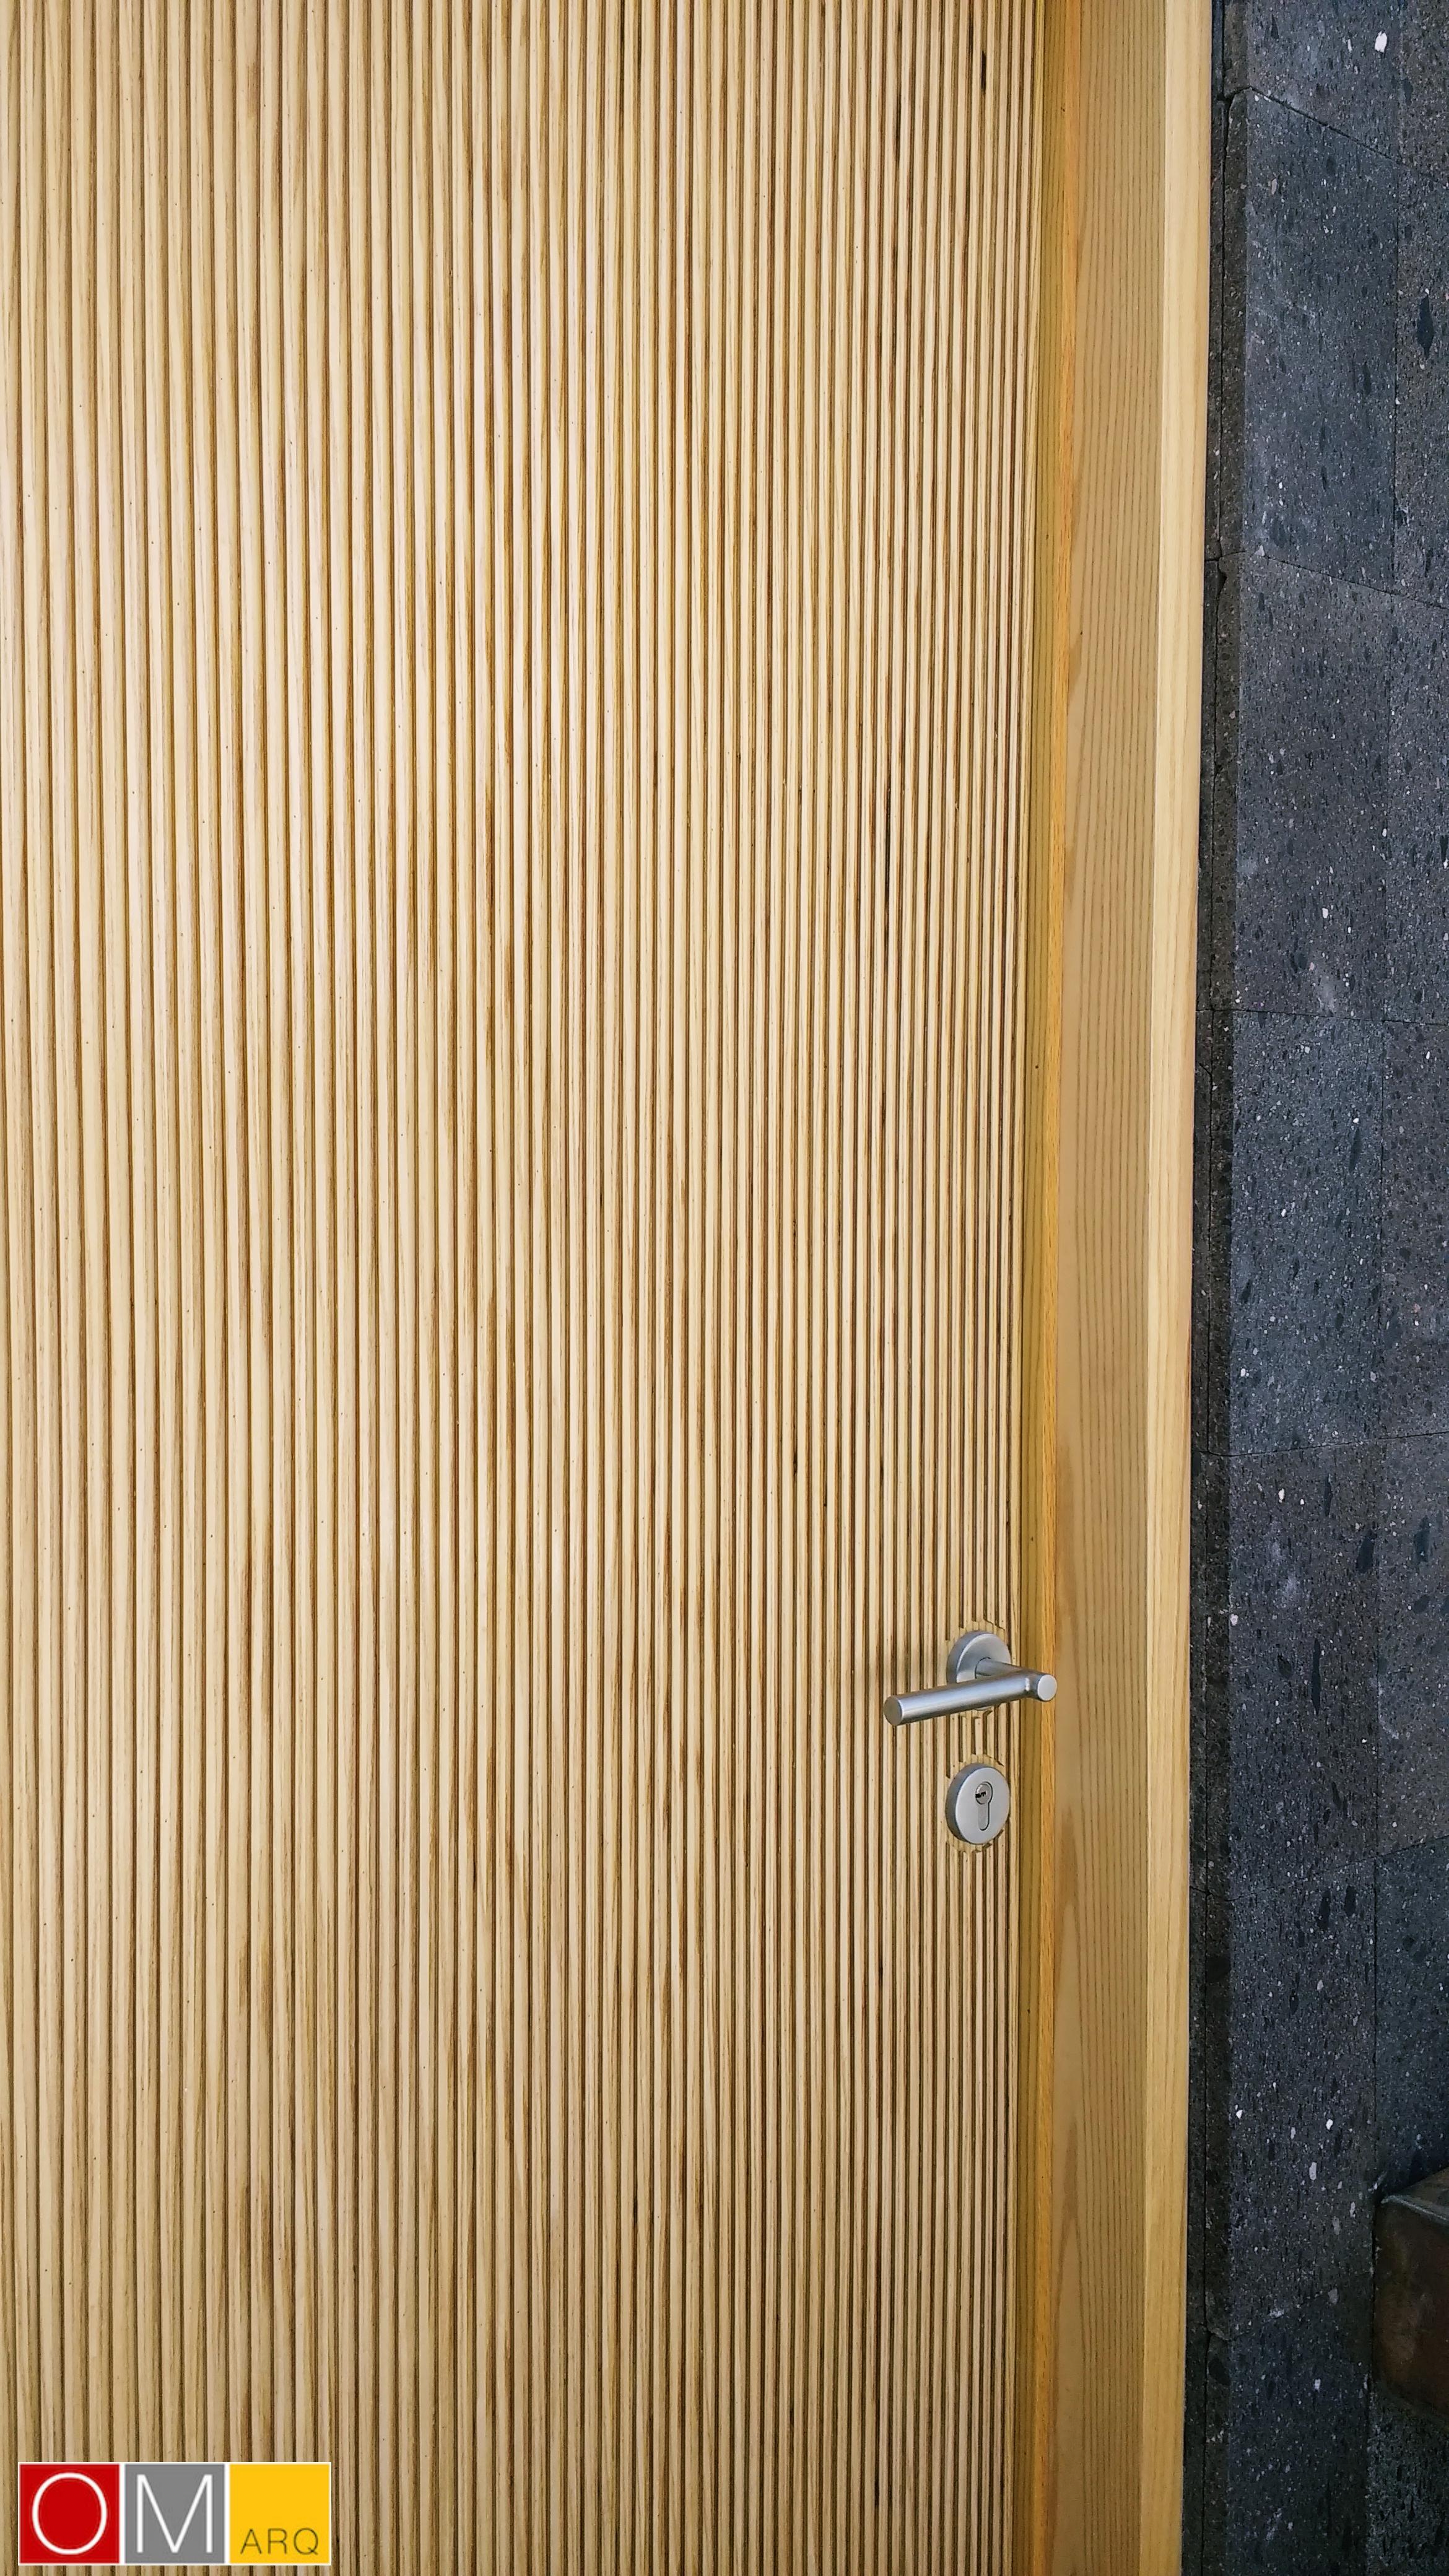 006 Puerta principal